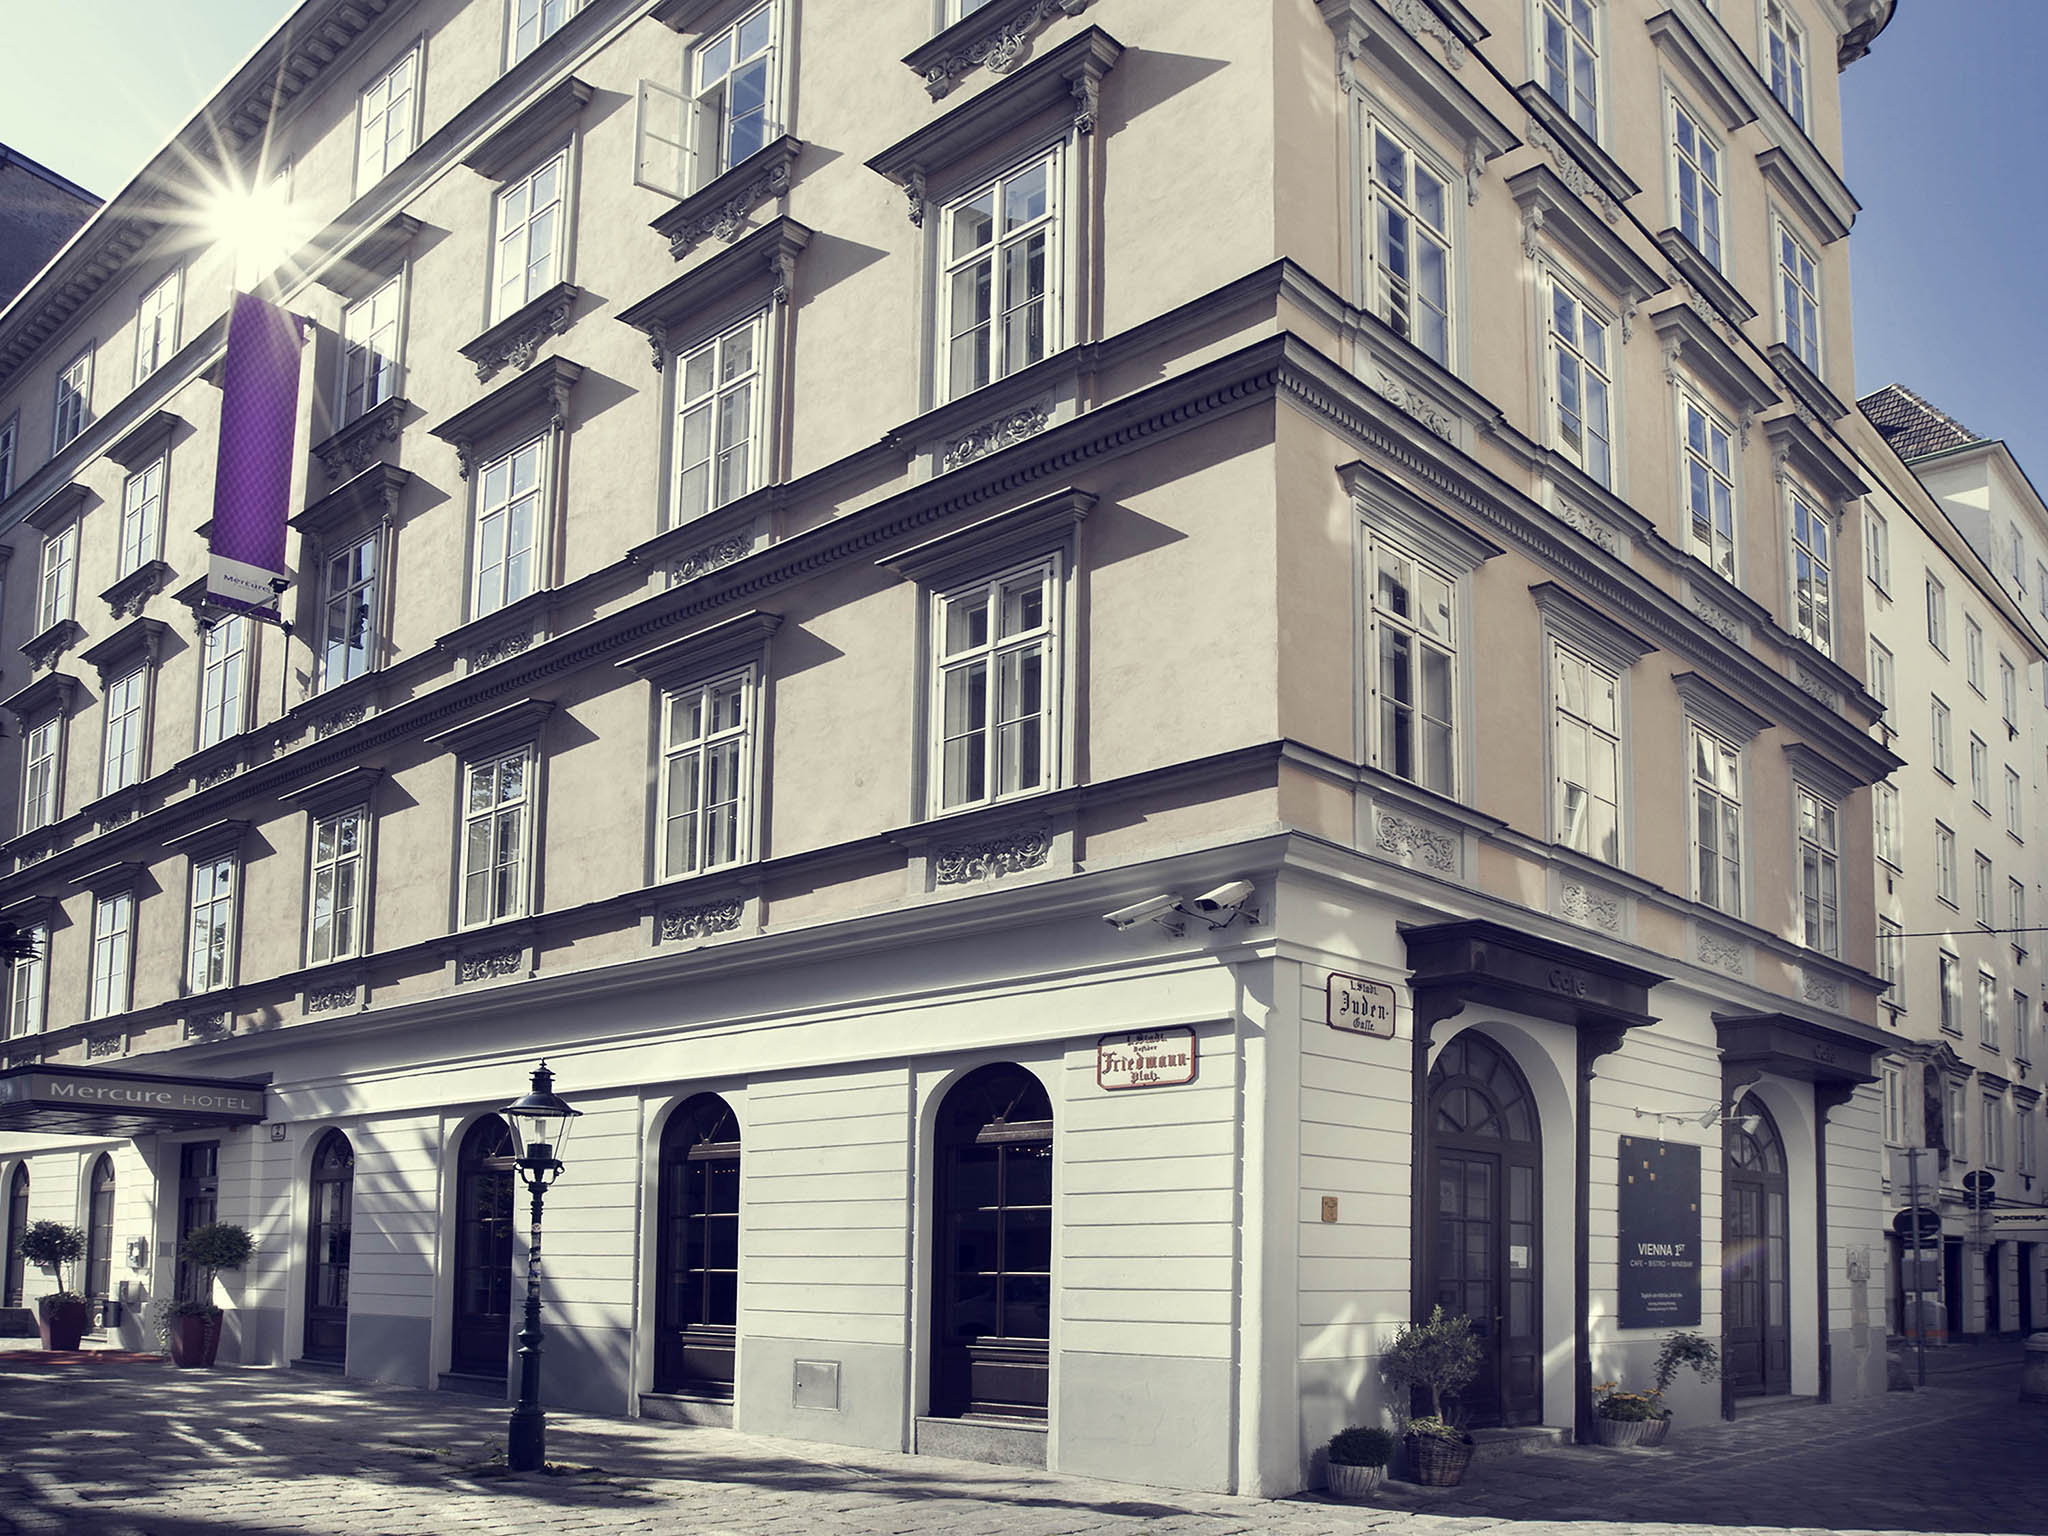 Mercure vienna first boutique hotel wien accor for Boutique hotel vienna